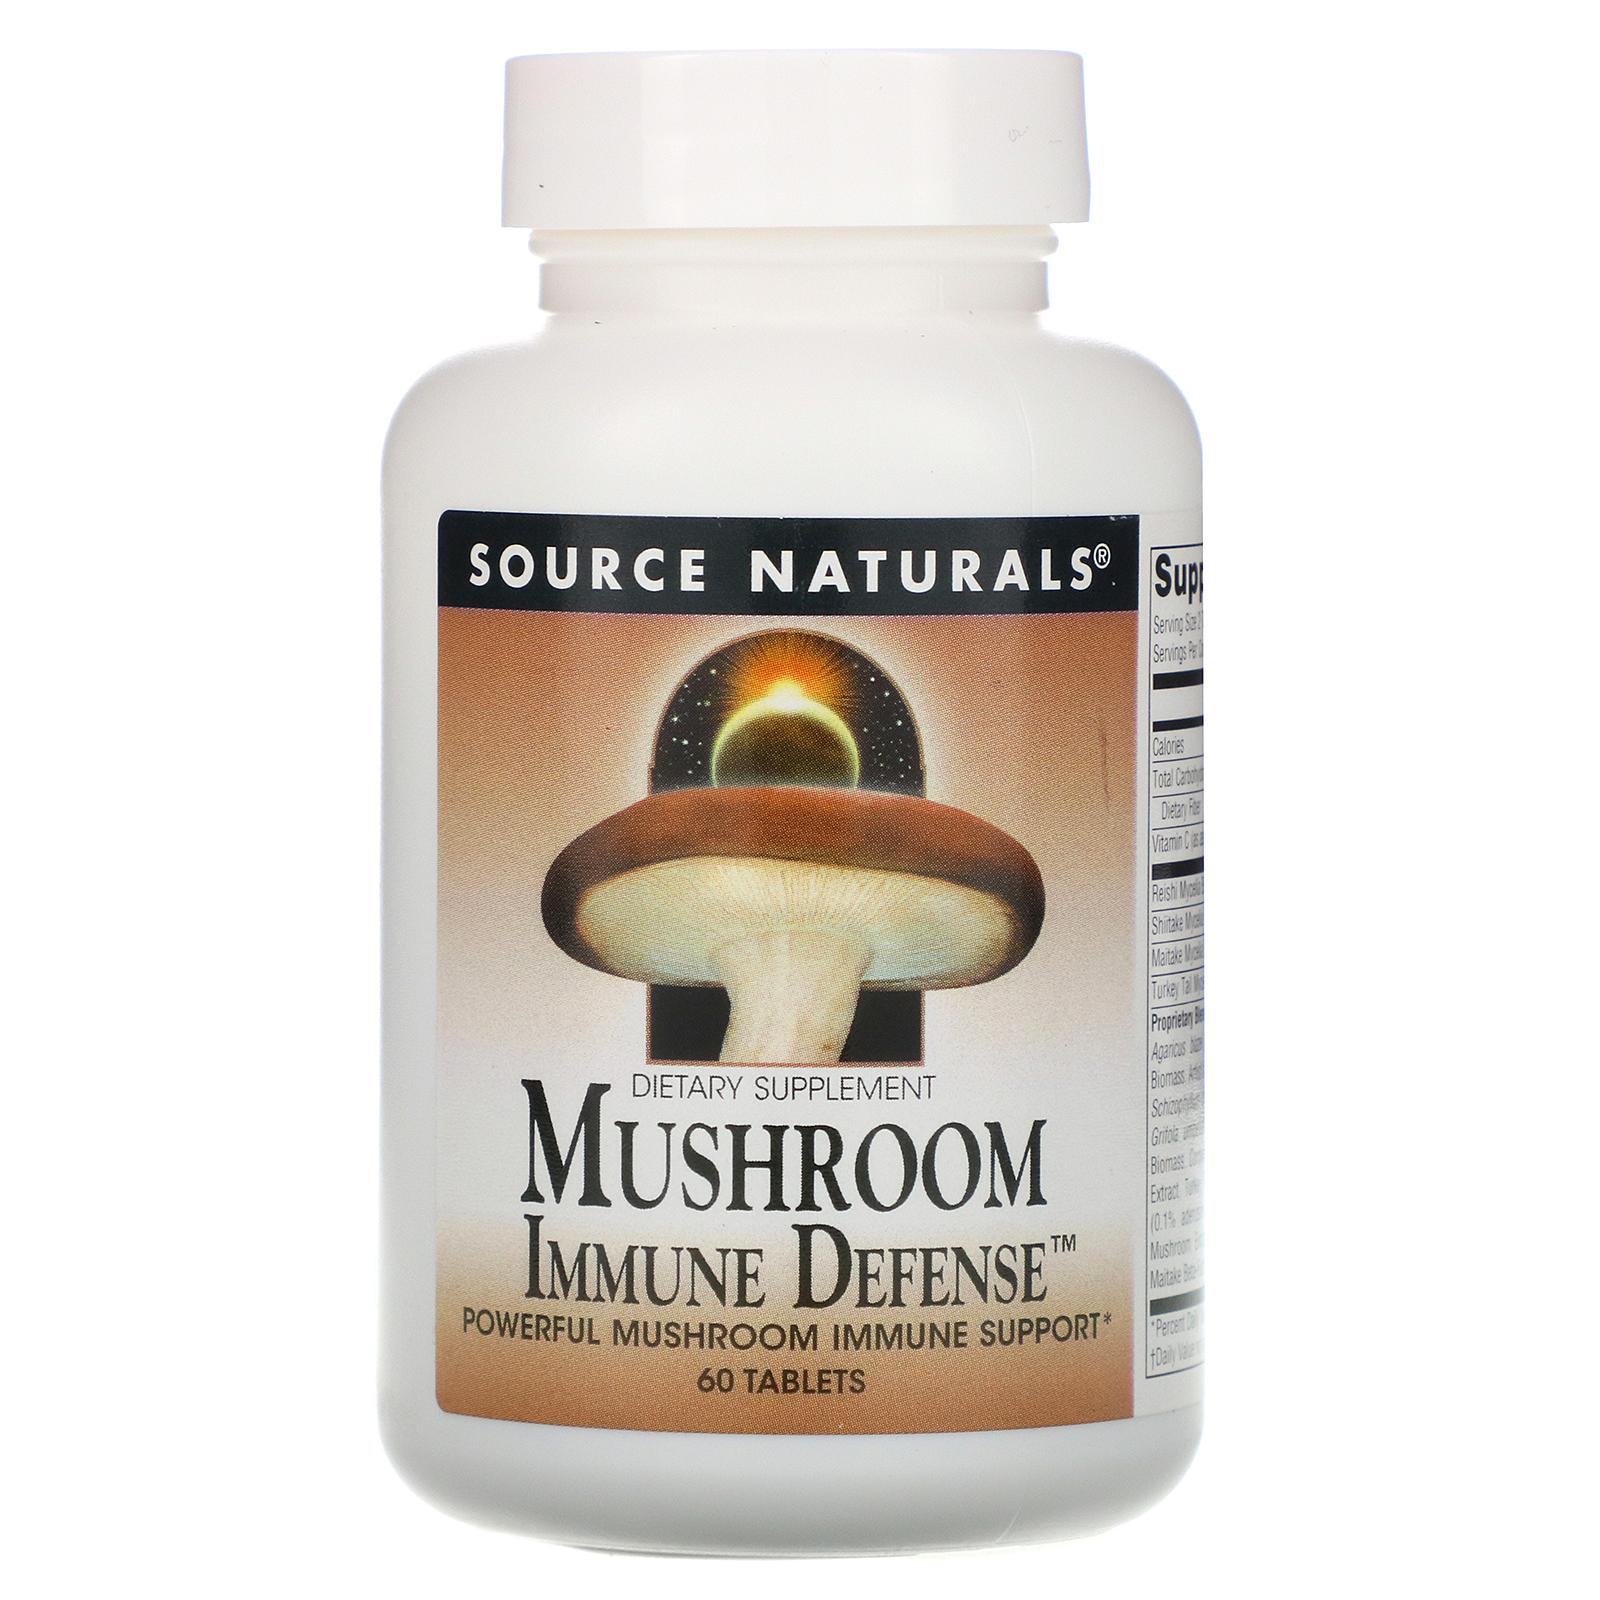 Source Naturals, Mushroom Immune Defense, 16-Mushroom Complex, 60 Tablets -  iHerb